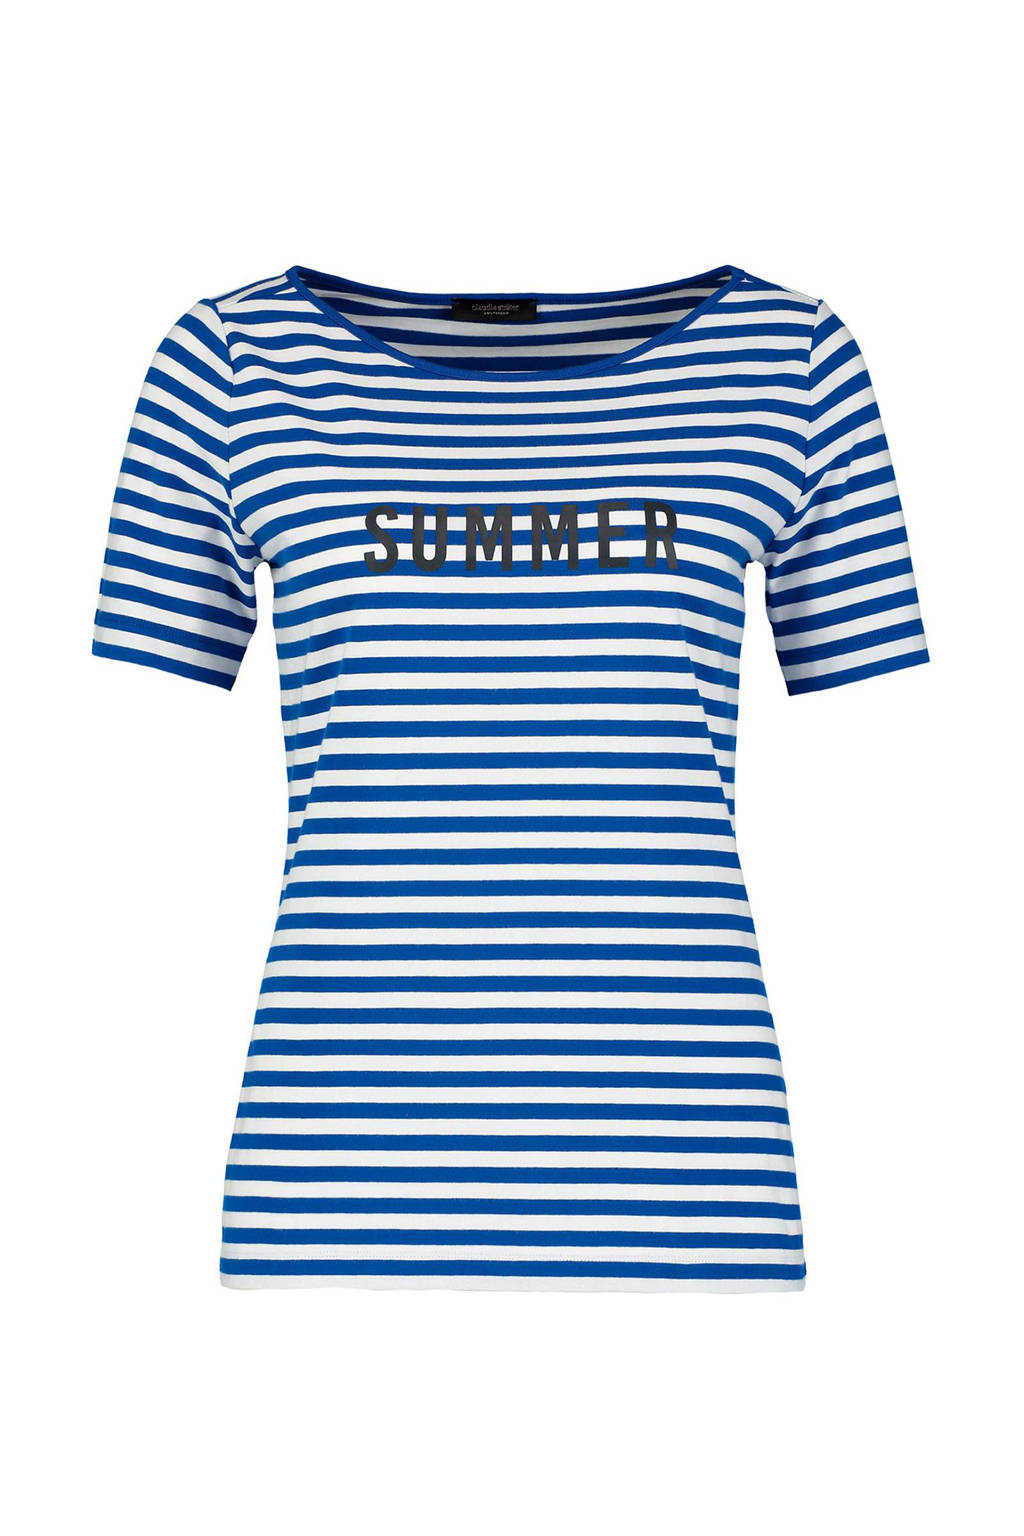 Claudia Sträter gestreept T-shirt blauw - wit, Blauw/wit